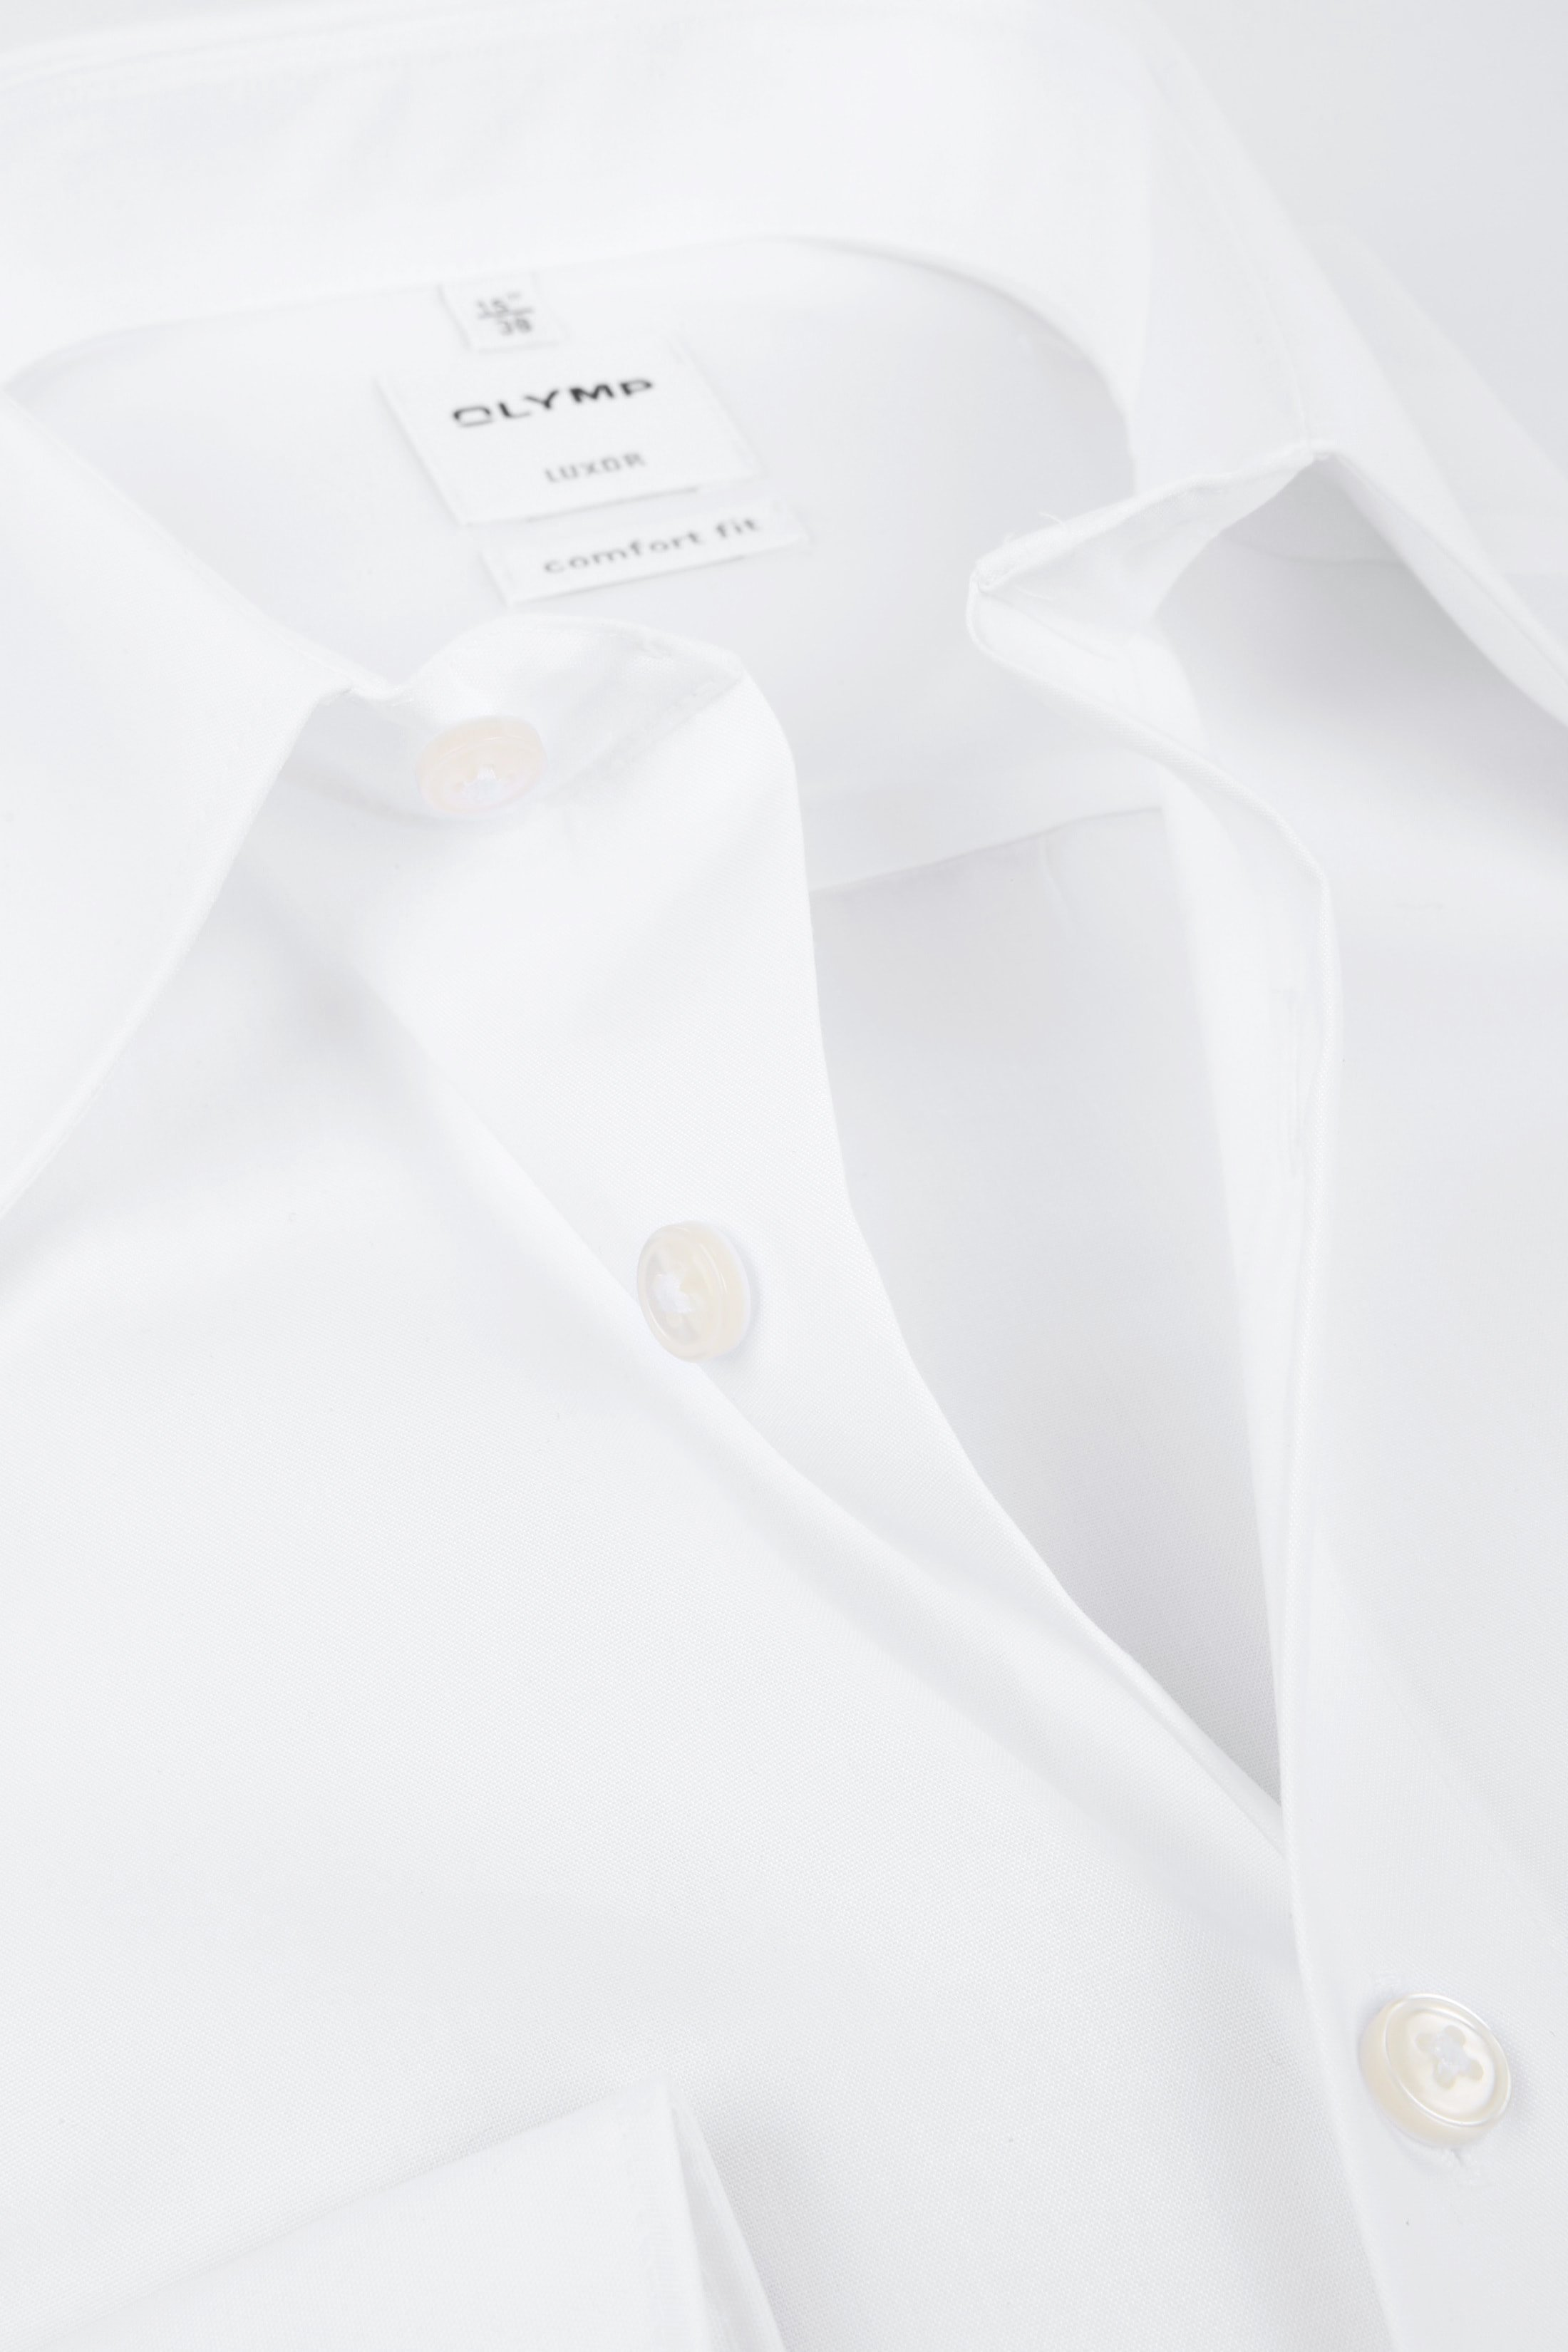 OLYMP Luxor Comfort Fit Overhemd Wit foto 1